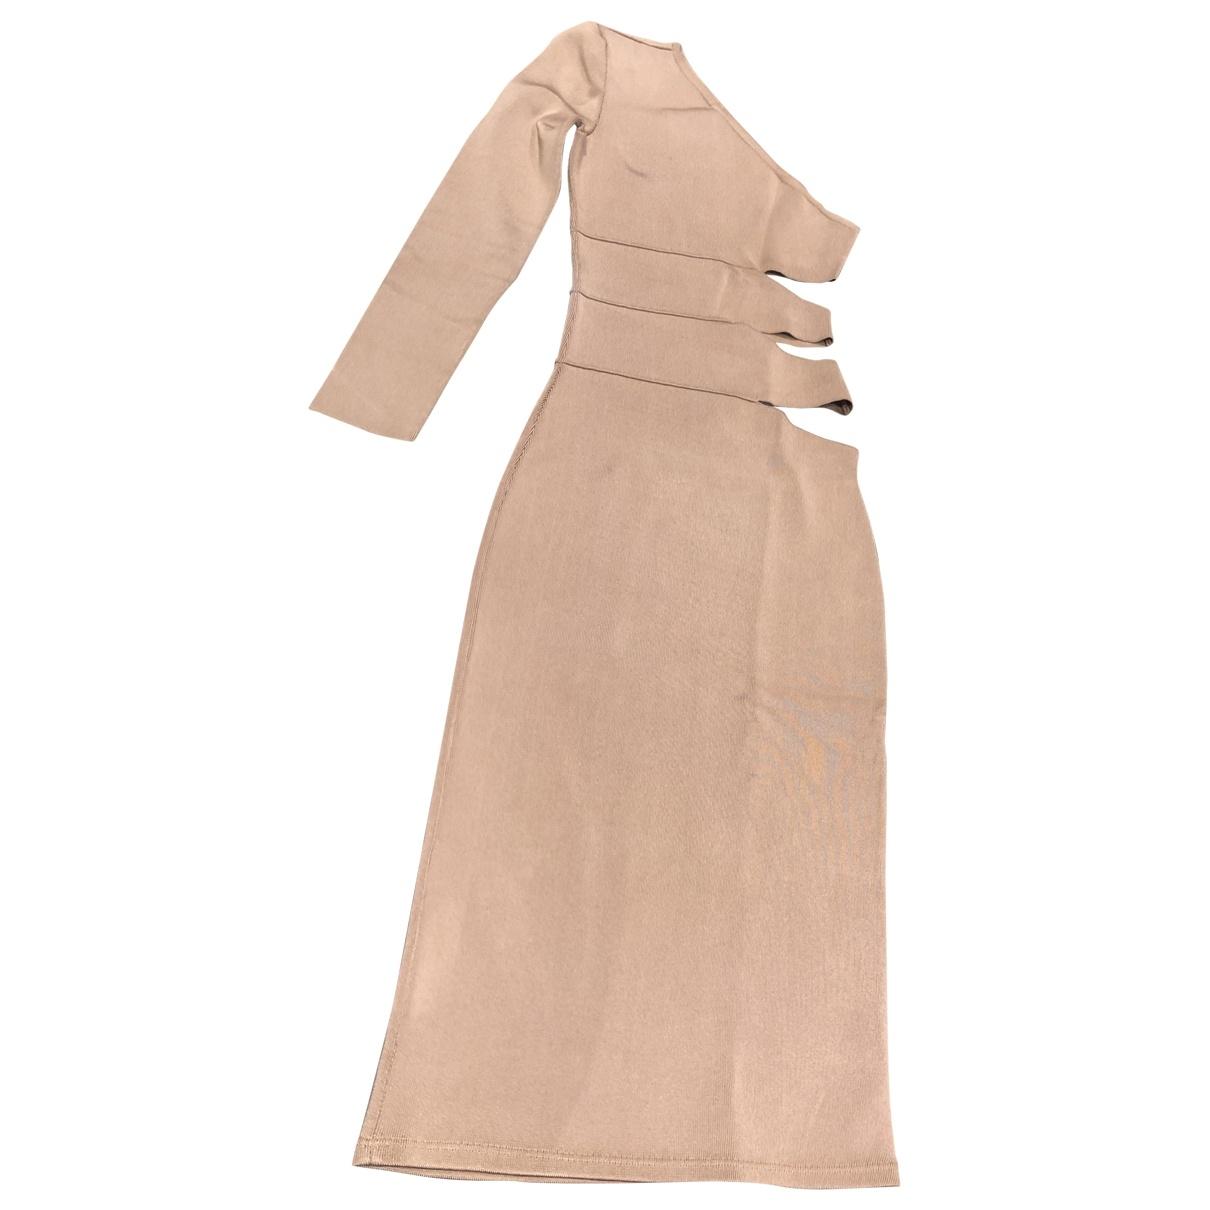 Balmain \N Beige dress for Women 36 FR